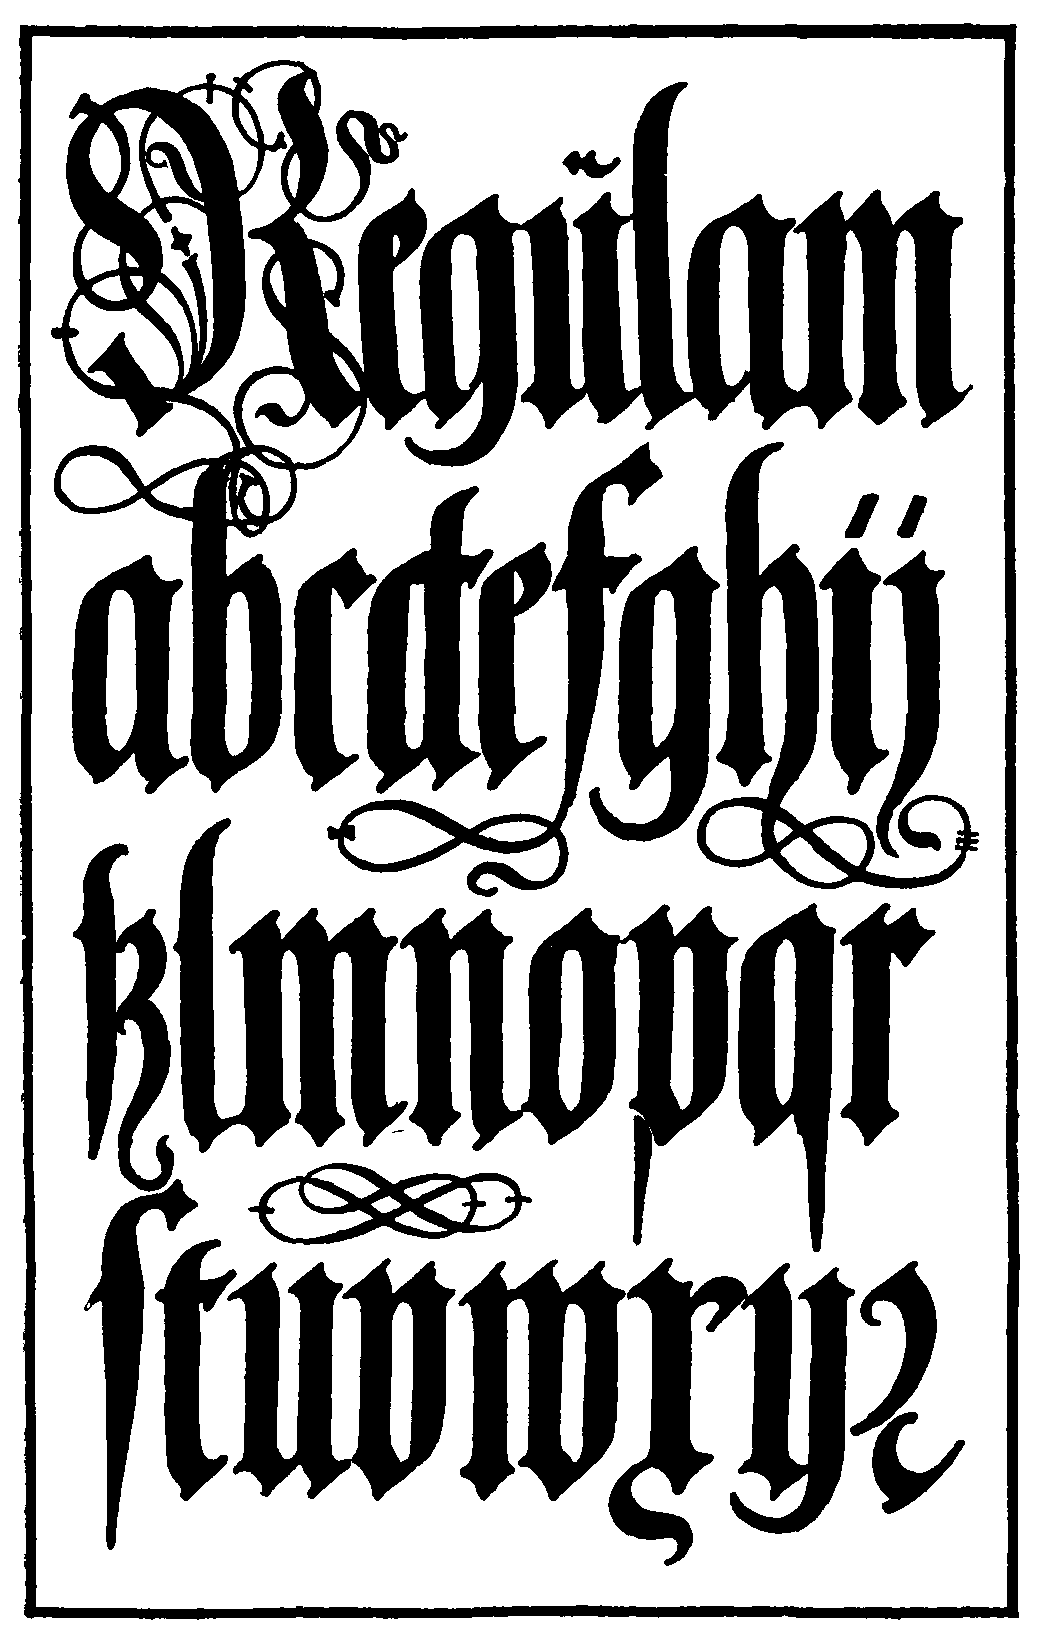 85 german gothic lettering tattoo alphabet fonts lettering tattoos designs kits videos ink. Black Bedroom Furniture Sets. Home Design Ideas